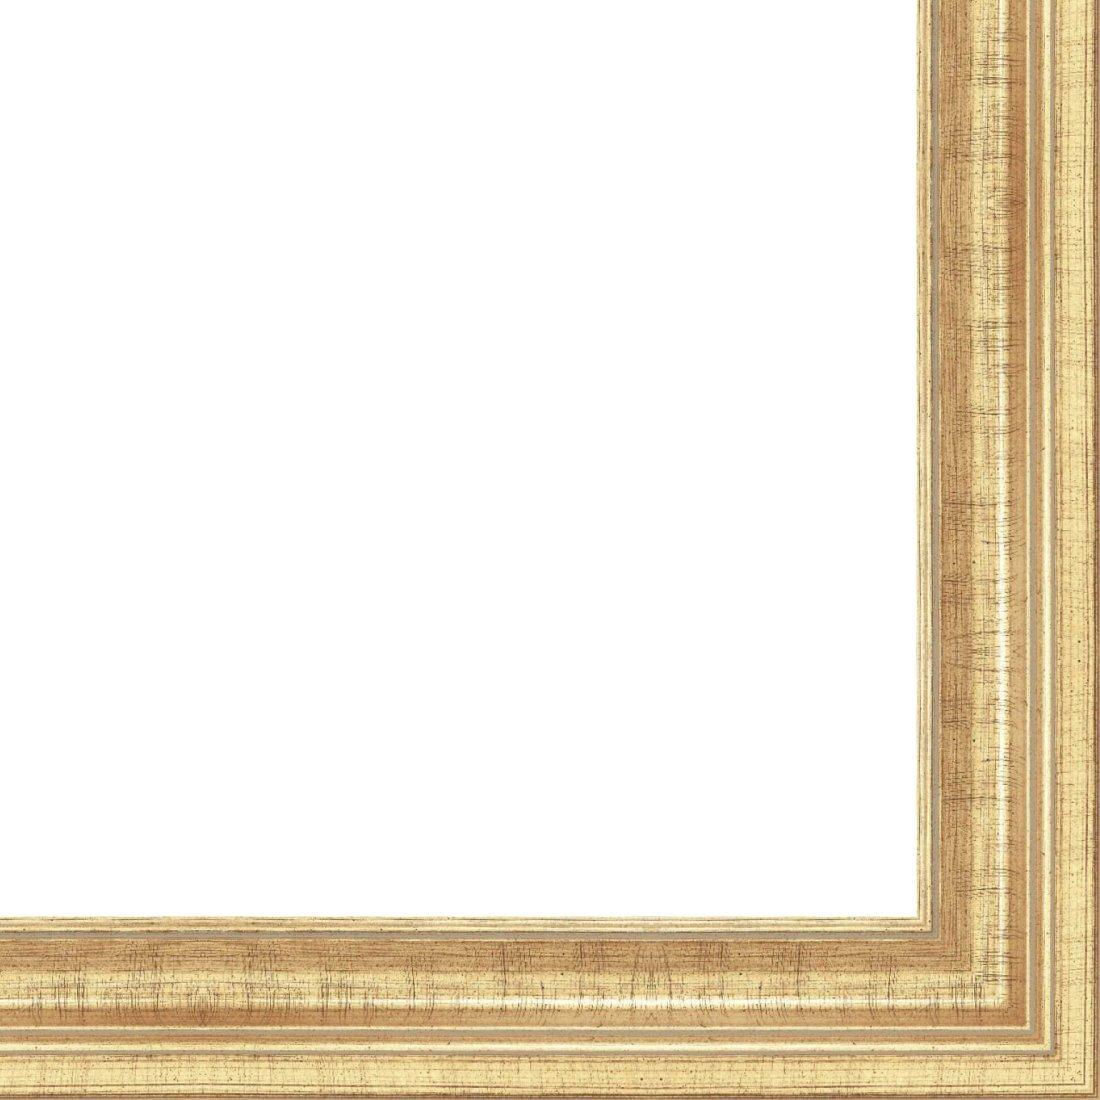 Picture Frame Moulding (Wood) 18ft bundle - Traditional Antique Gold Finish - 2.25'' width - 9/16'' rabbet depth